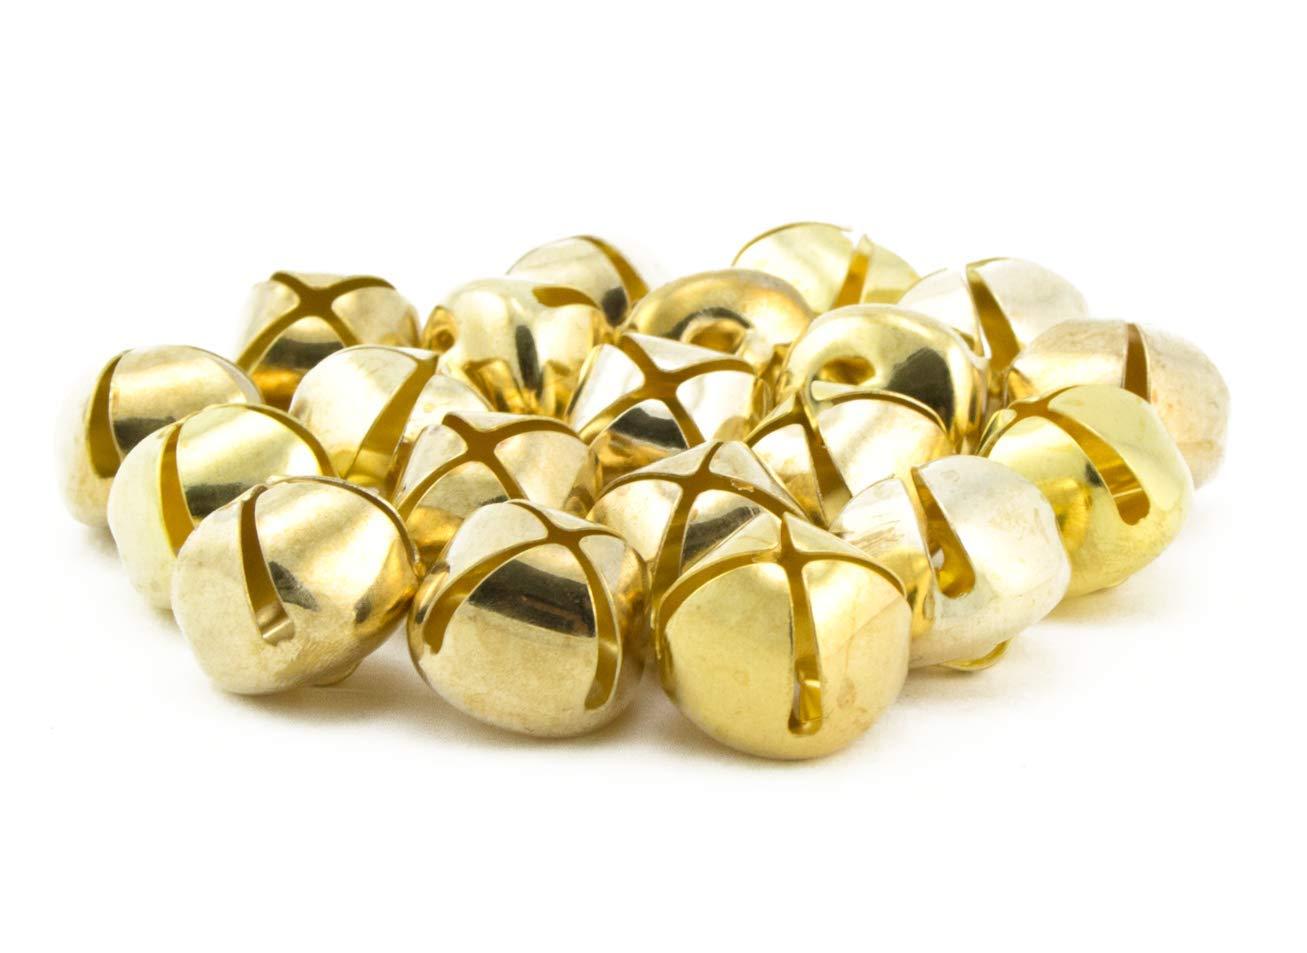 0.75 inch 20mm Gold Small Craft Jingle Bells Bulk 120 Pieces